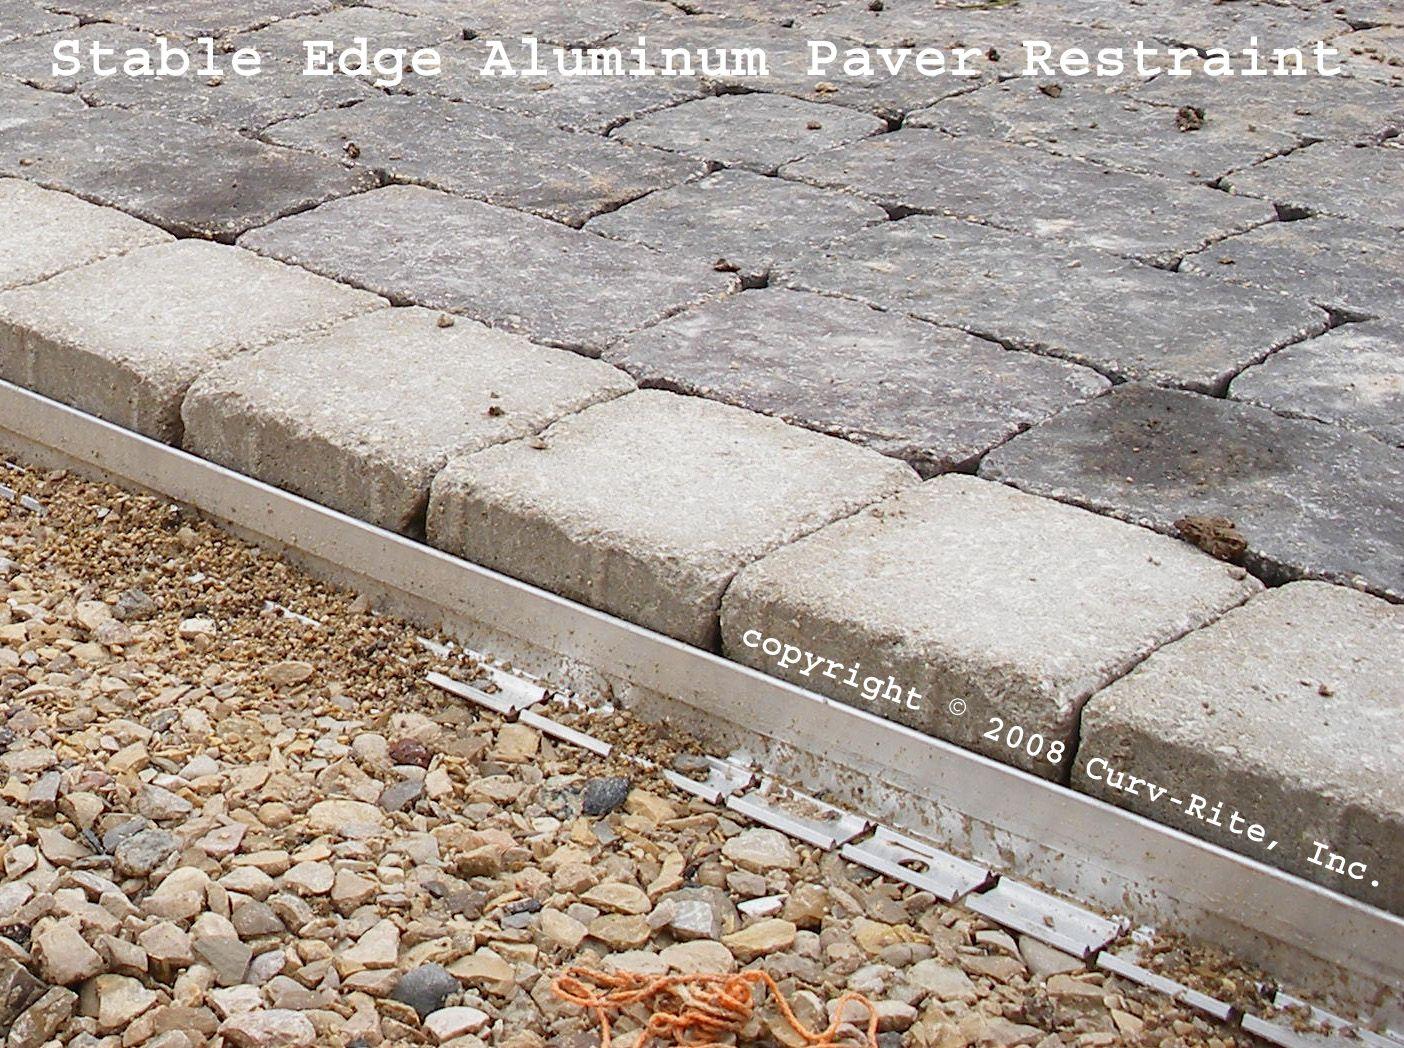 Stable Edge Aluminum Paver Restraint Garden Pavers Paver Edging Landscaping A Slope